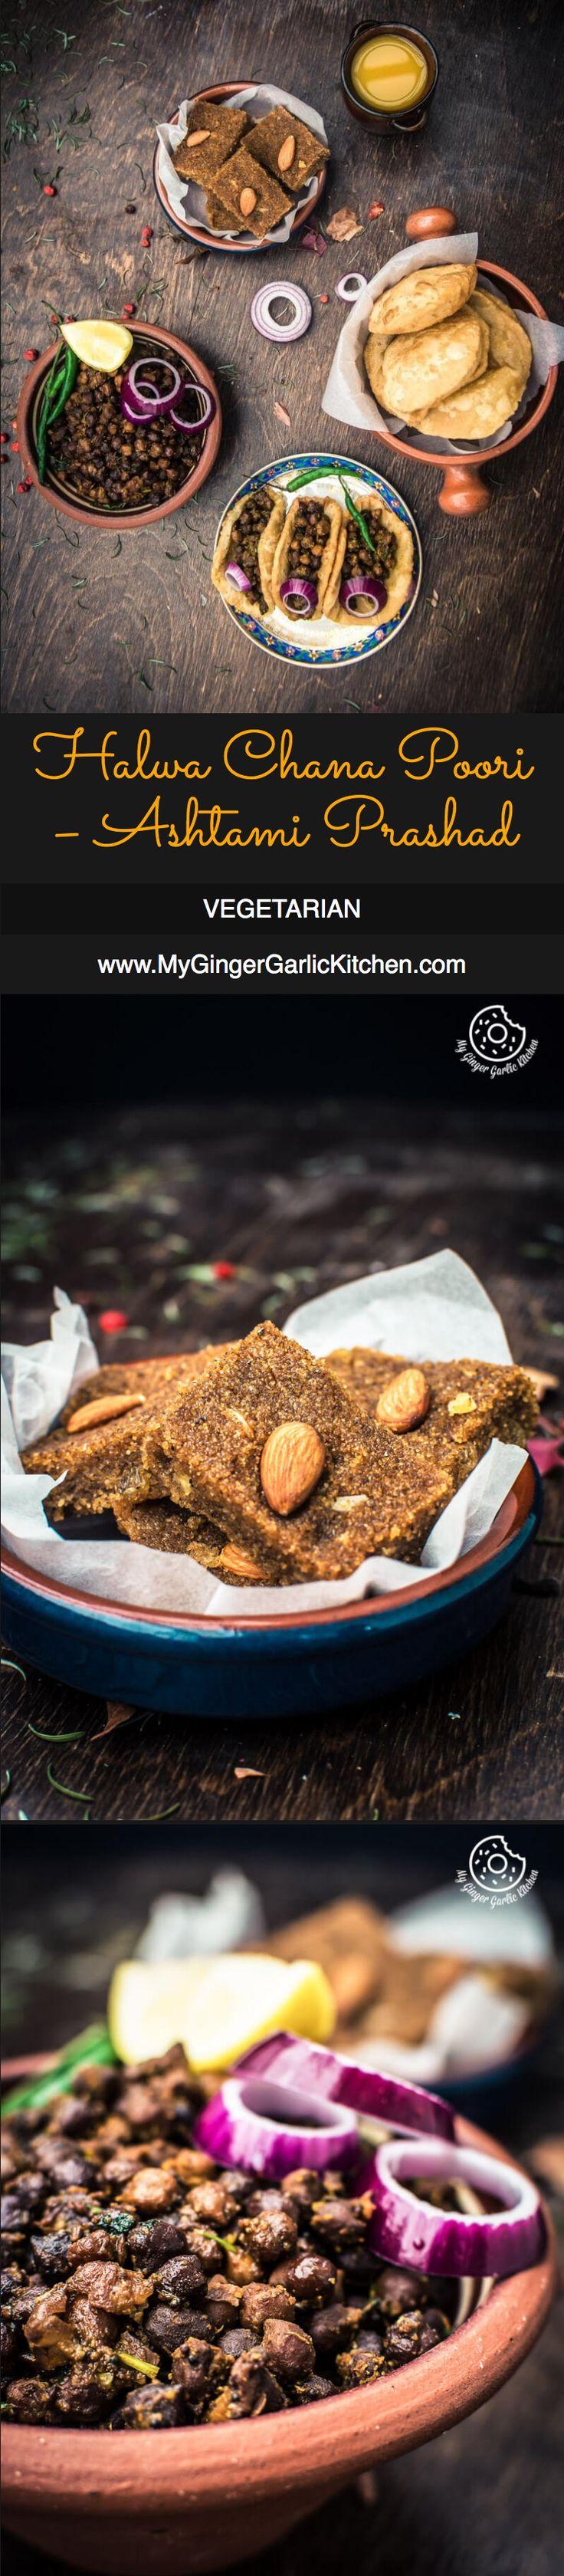 Sooji Halwa, Sookha Kala Chana and Puffed Pooris make a great Ashtami Prasad.